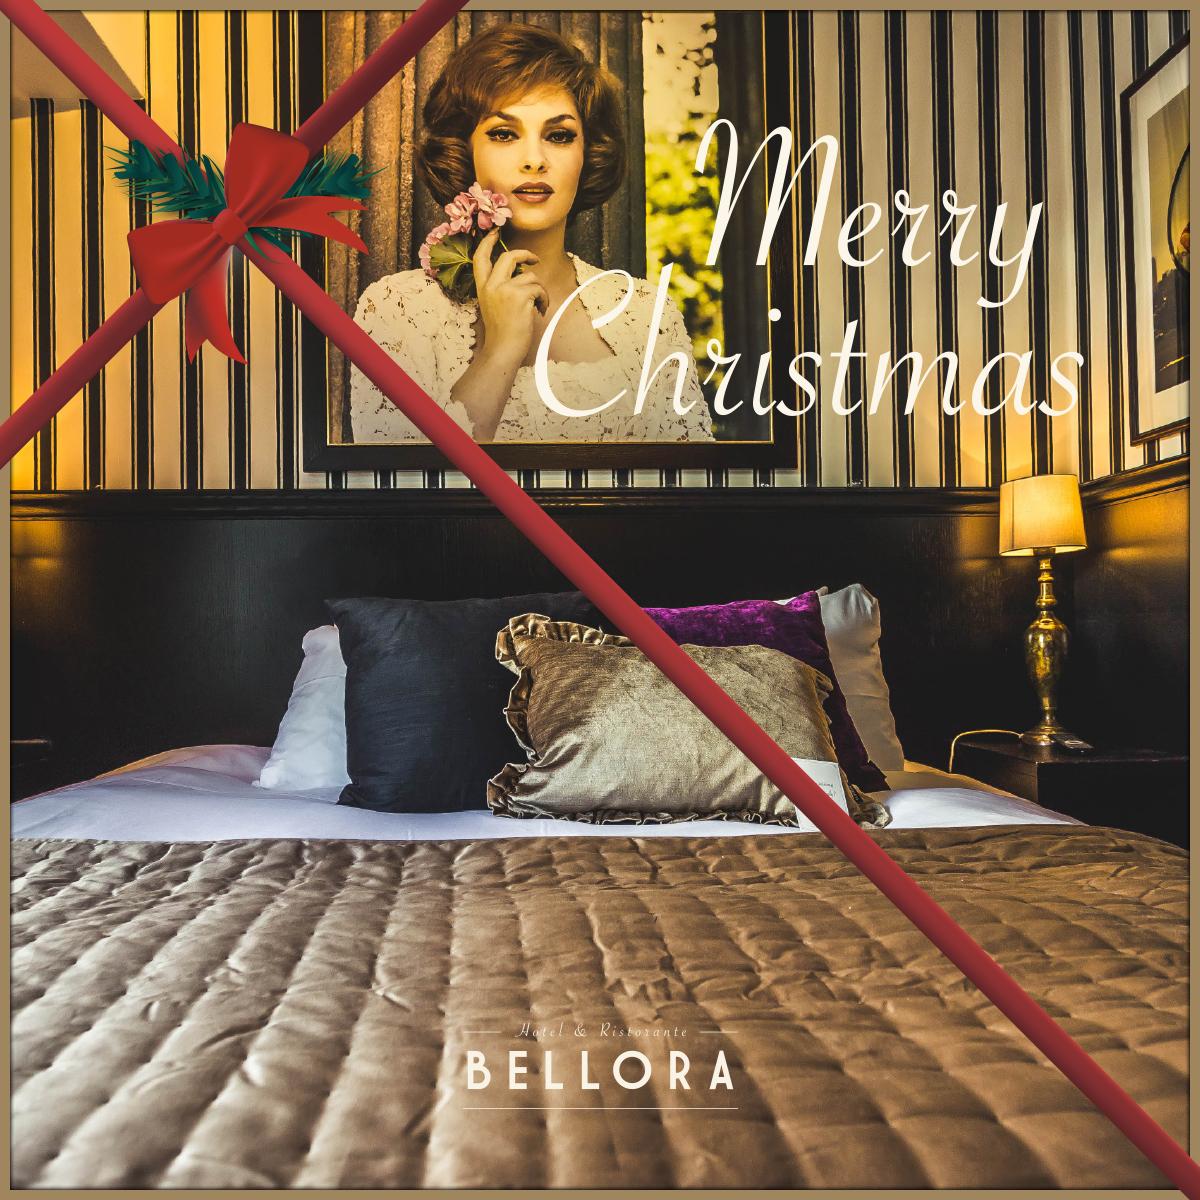 bellora-julklapp-some-vardagar